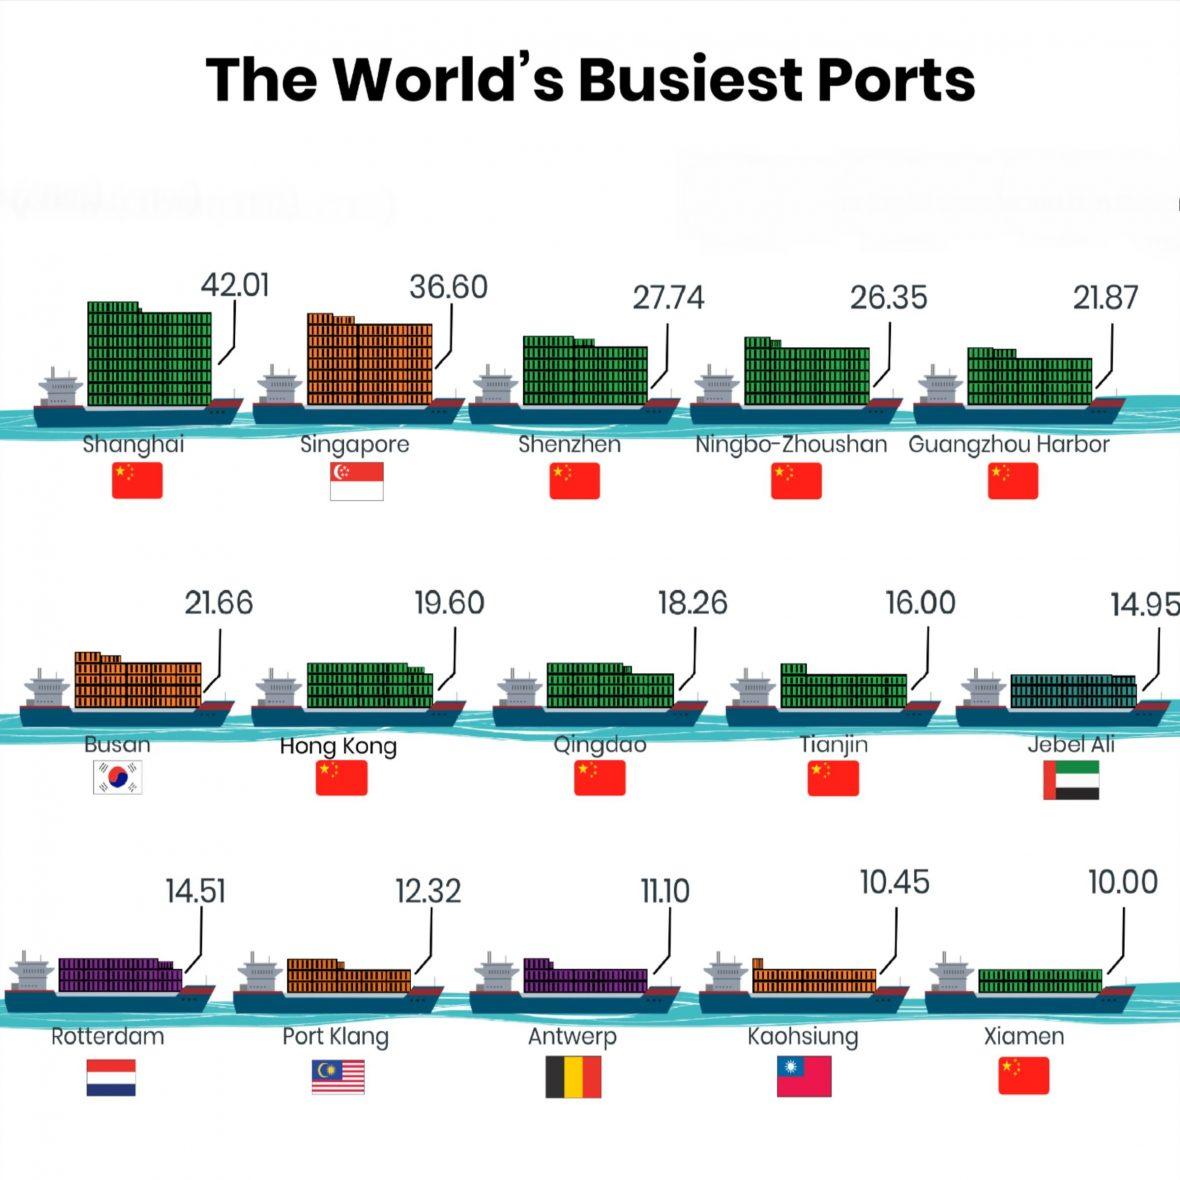 ports of world